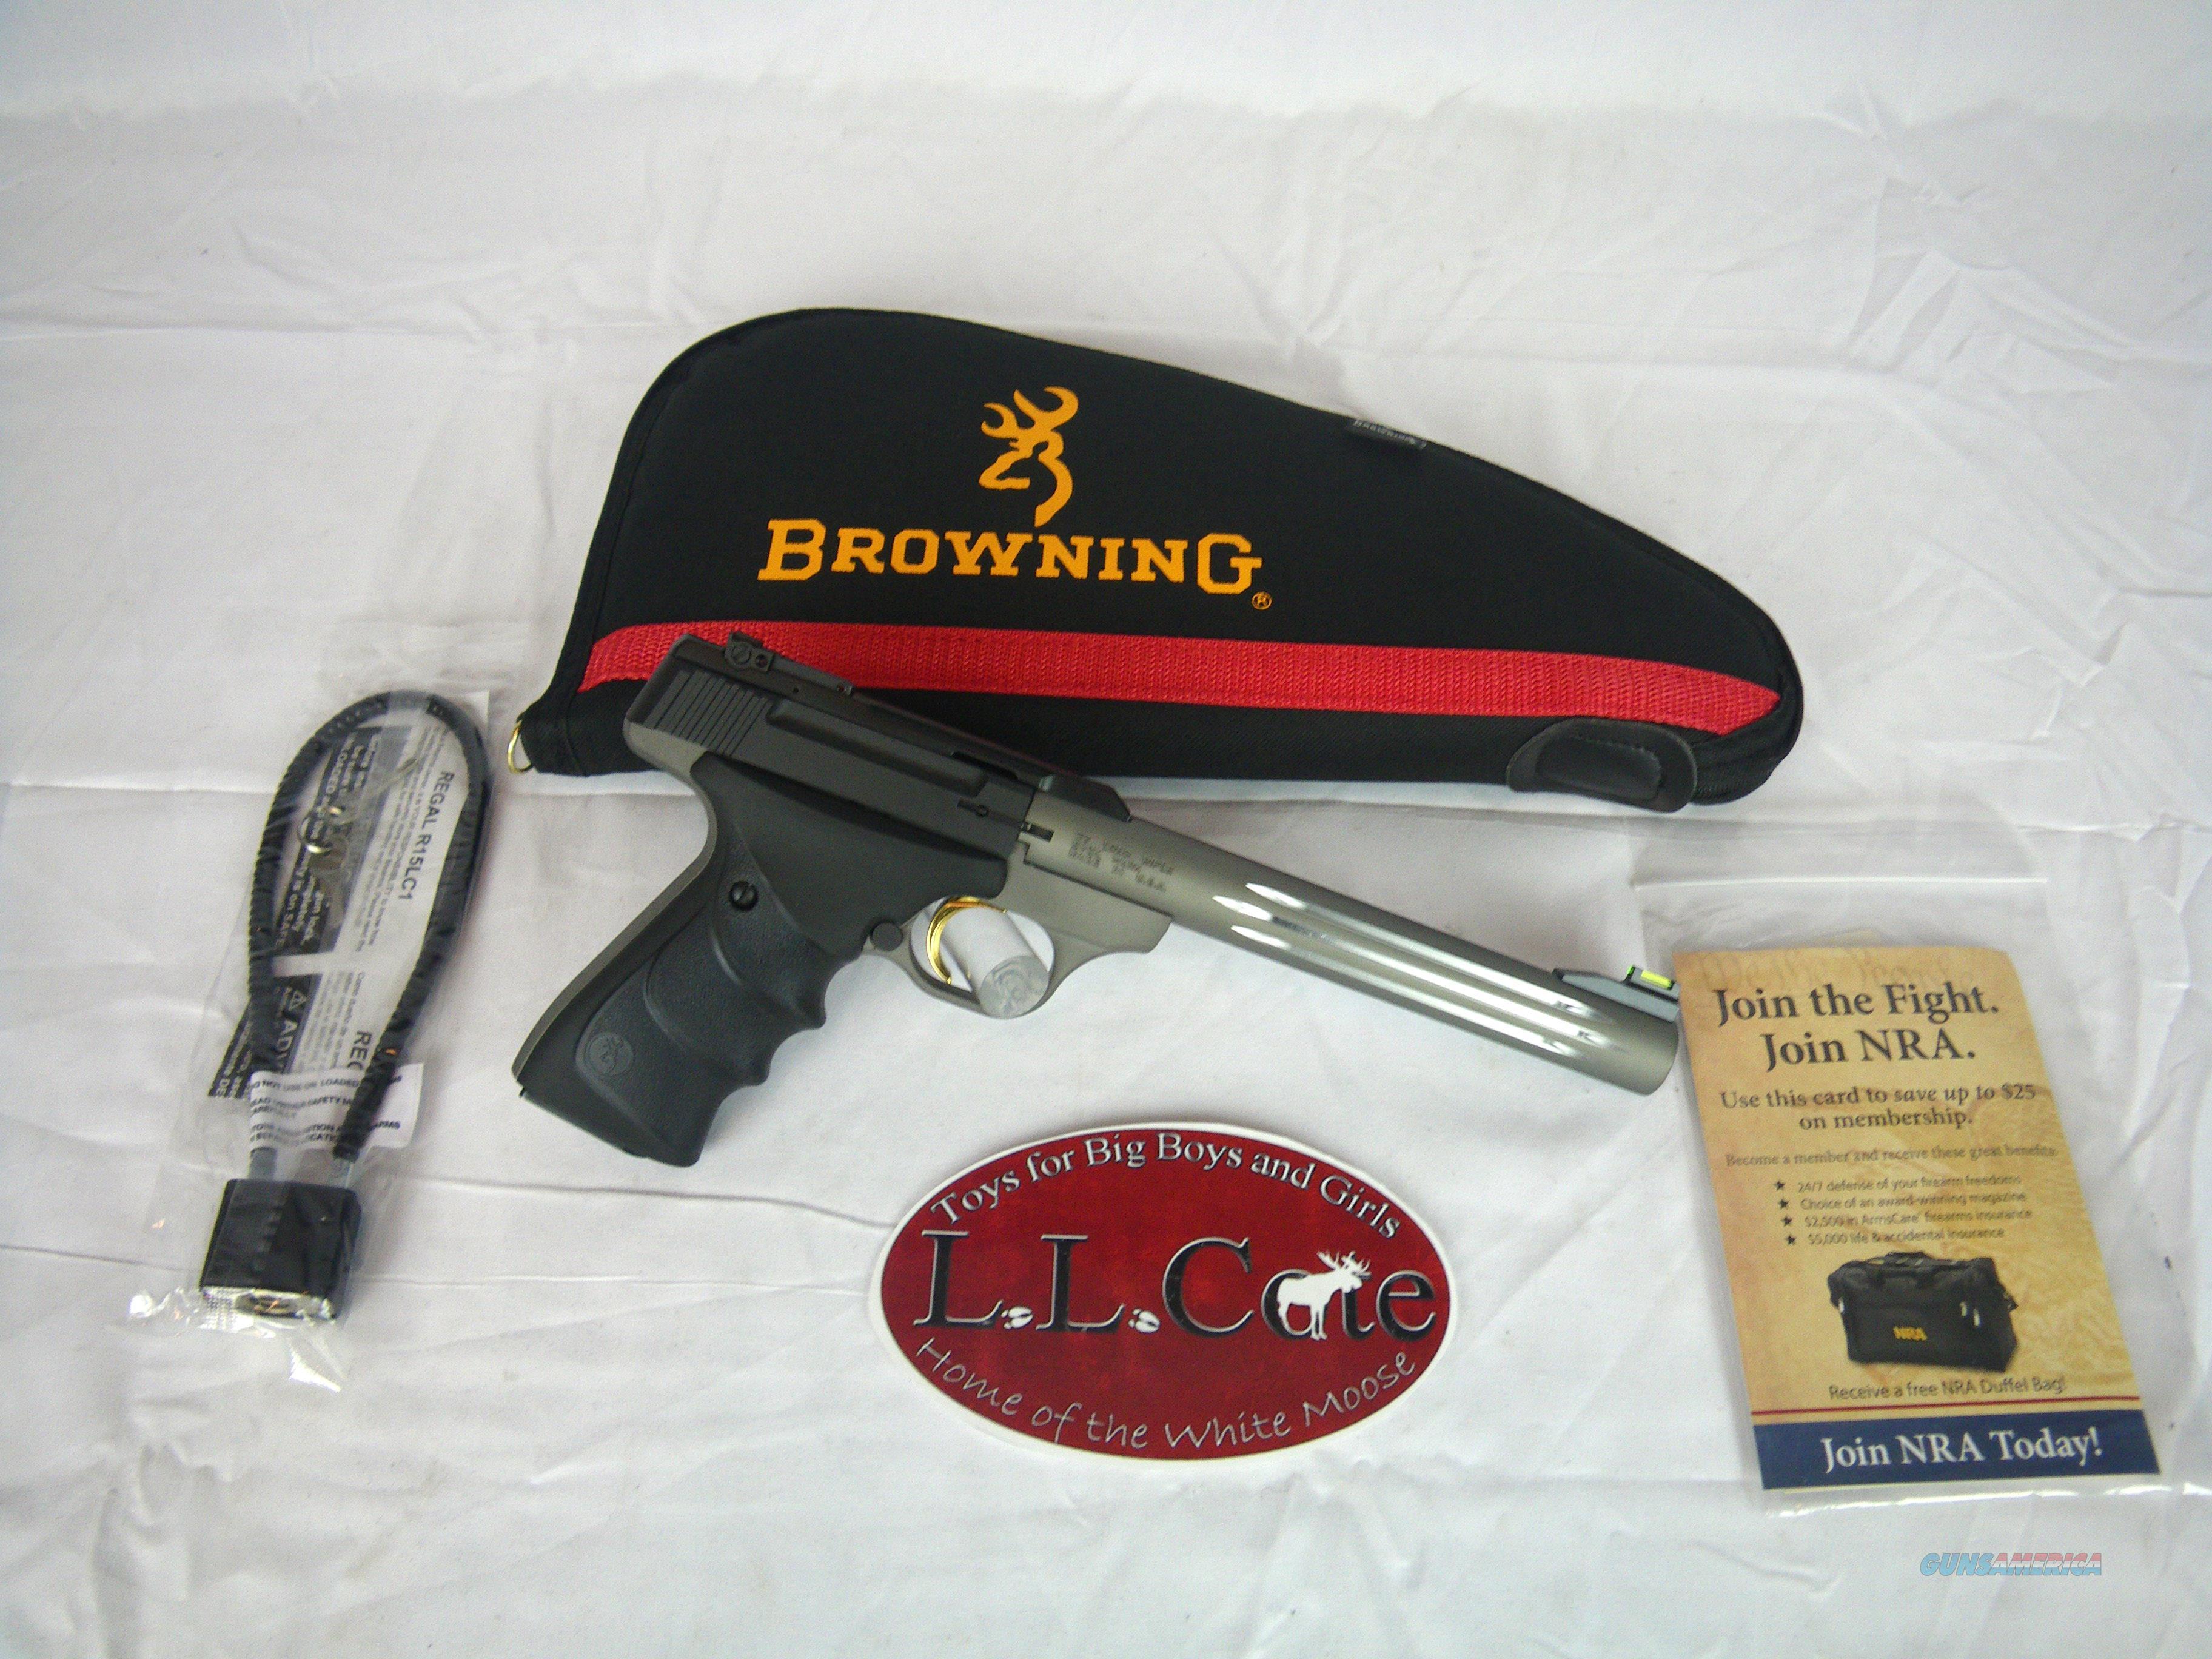 Browning Buckmark Lite Gray URX 22lr 7.5 #051517490  Guns > Pistols > Browning Pistols > Buckmark